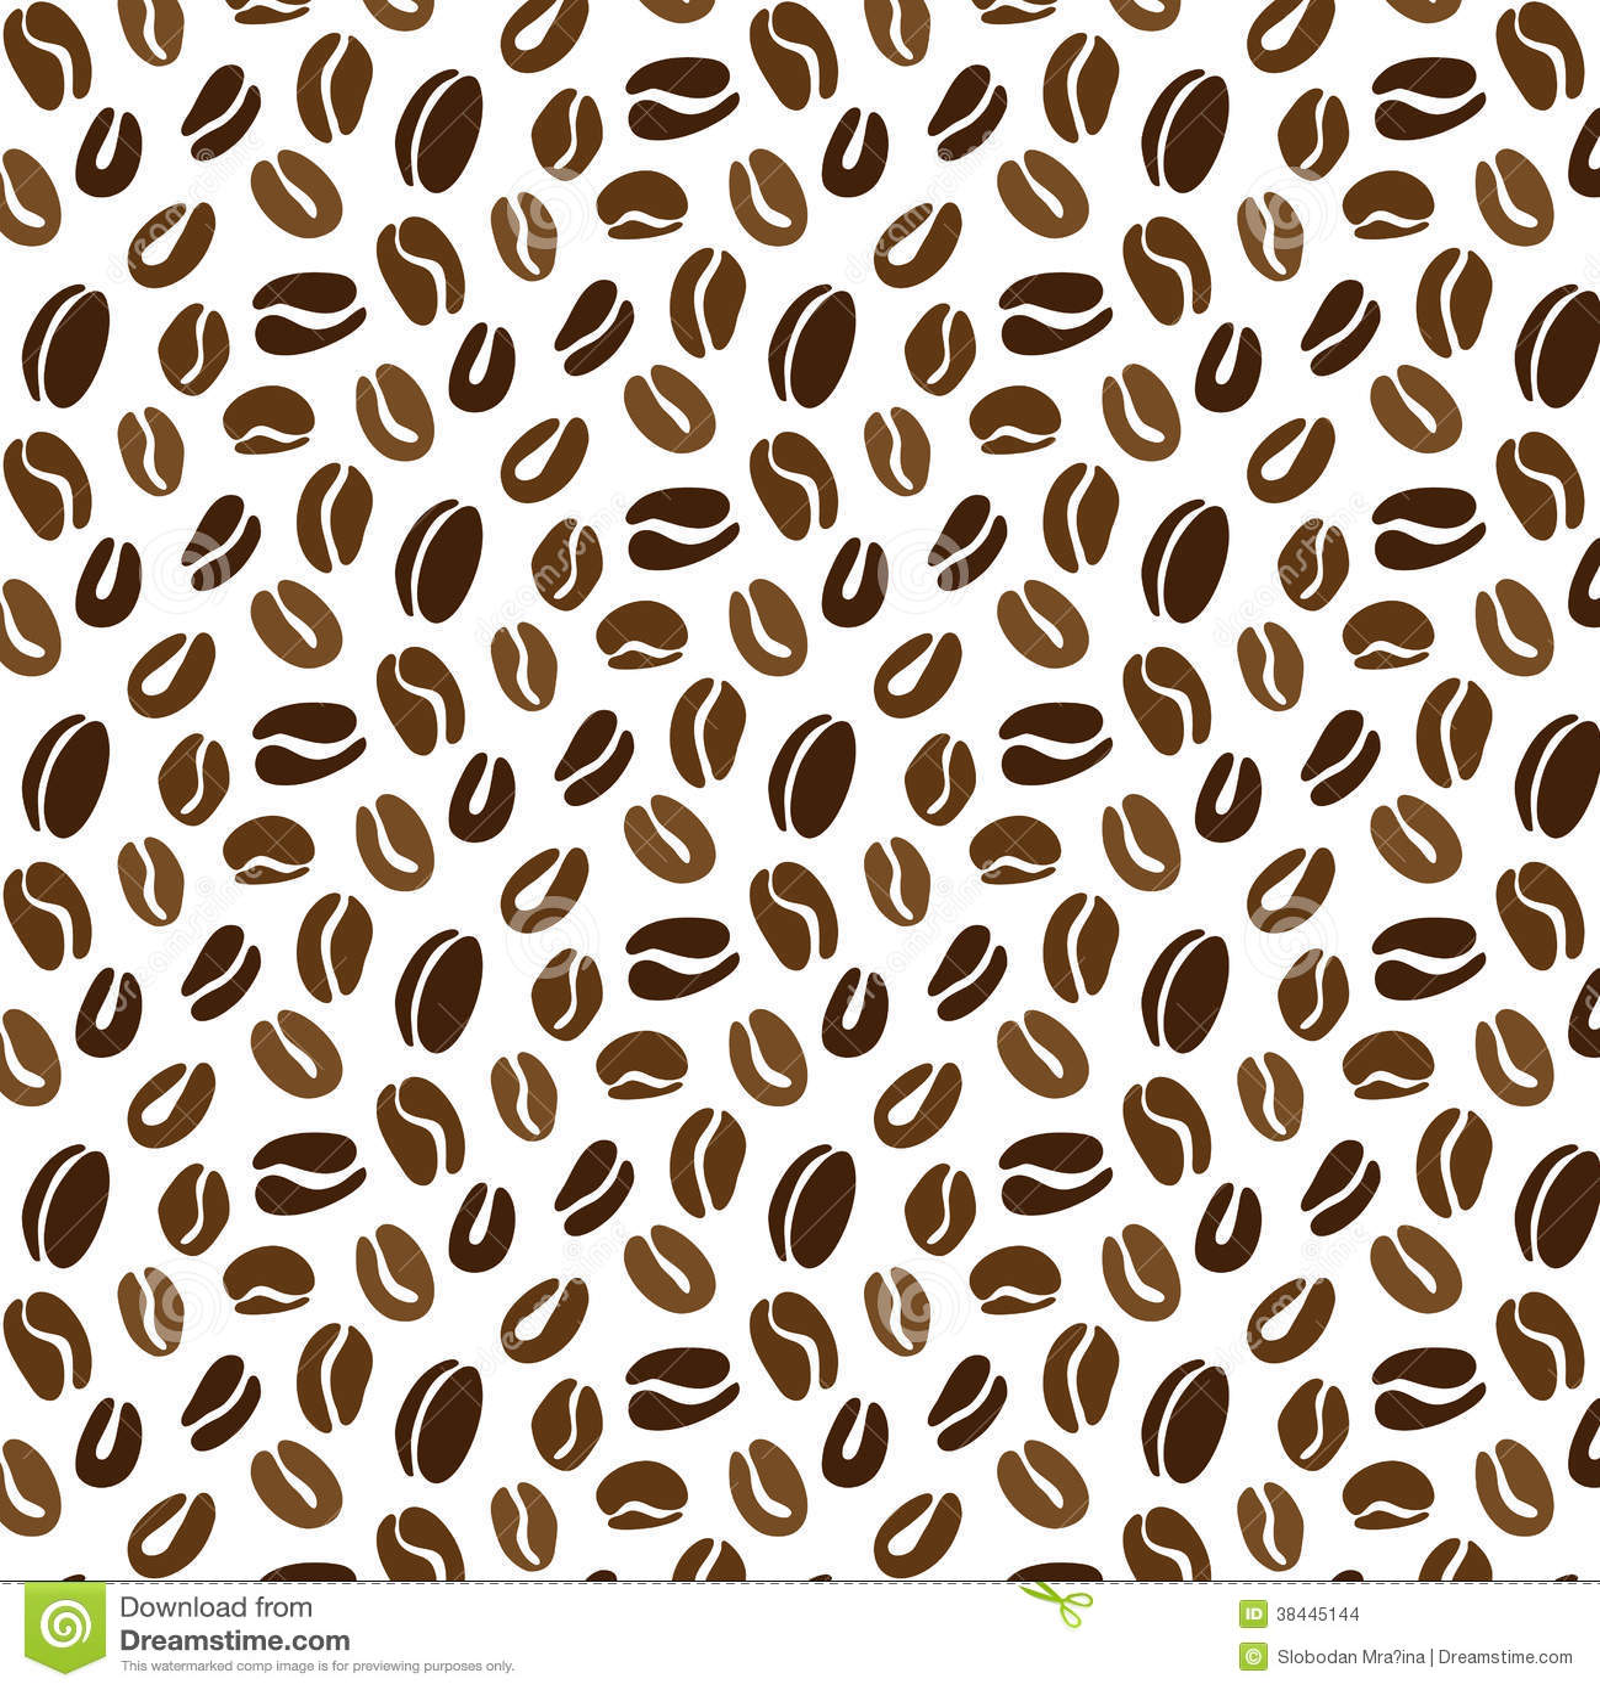 Roasted Beans Cafe Menu